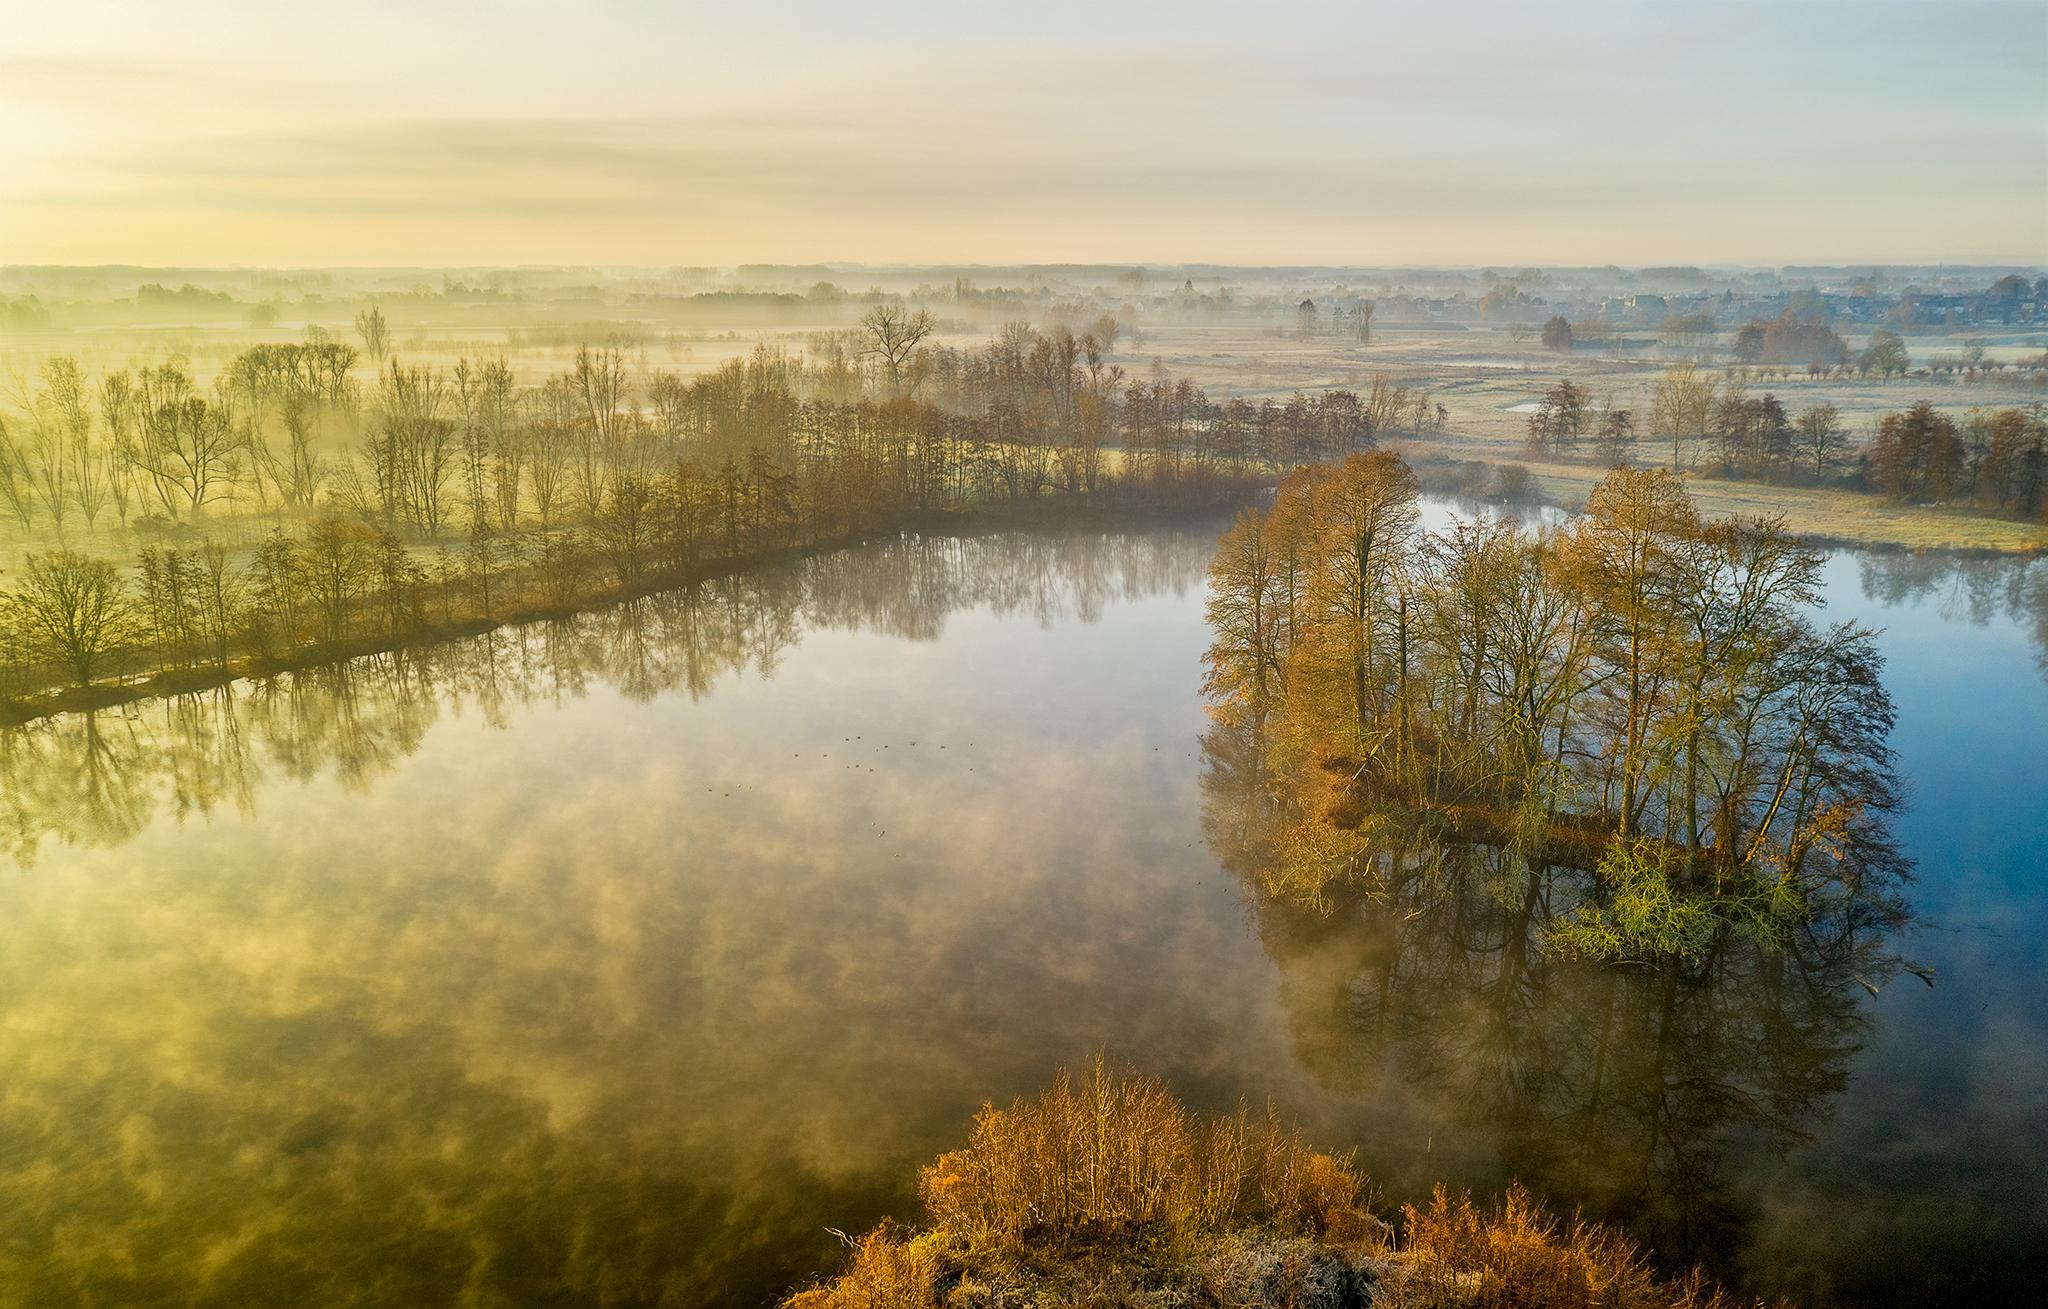 Kalkense Meersen on a cold, misty morning., Belgium